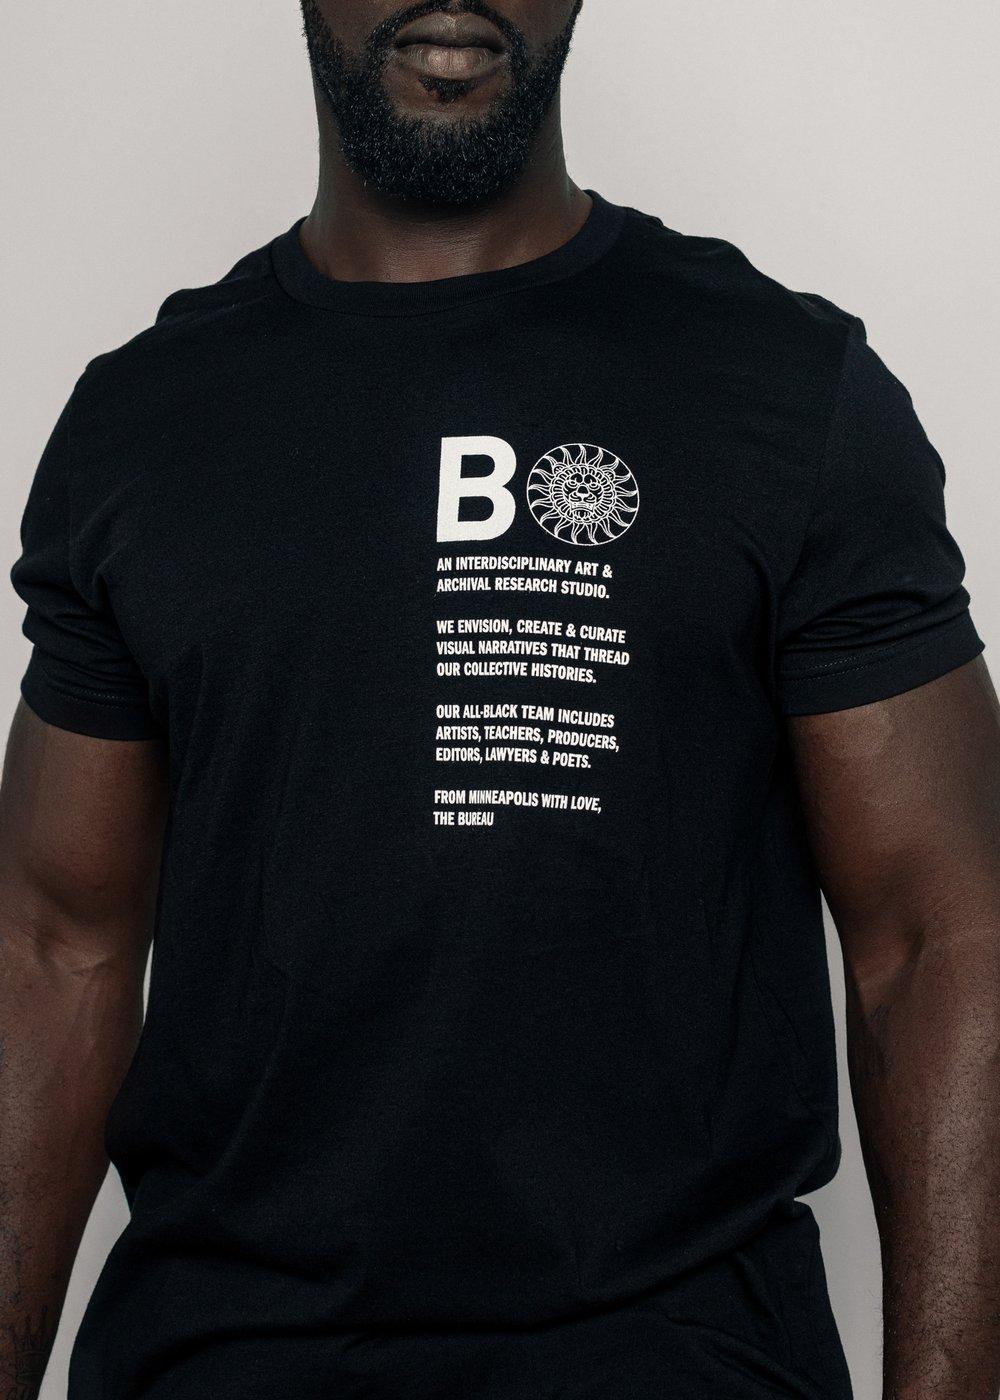 Mission T-shirt (Black/White)